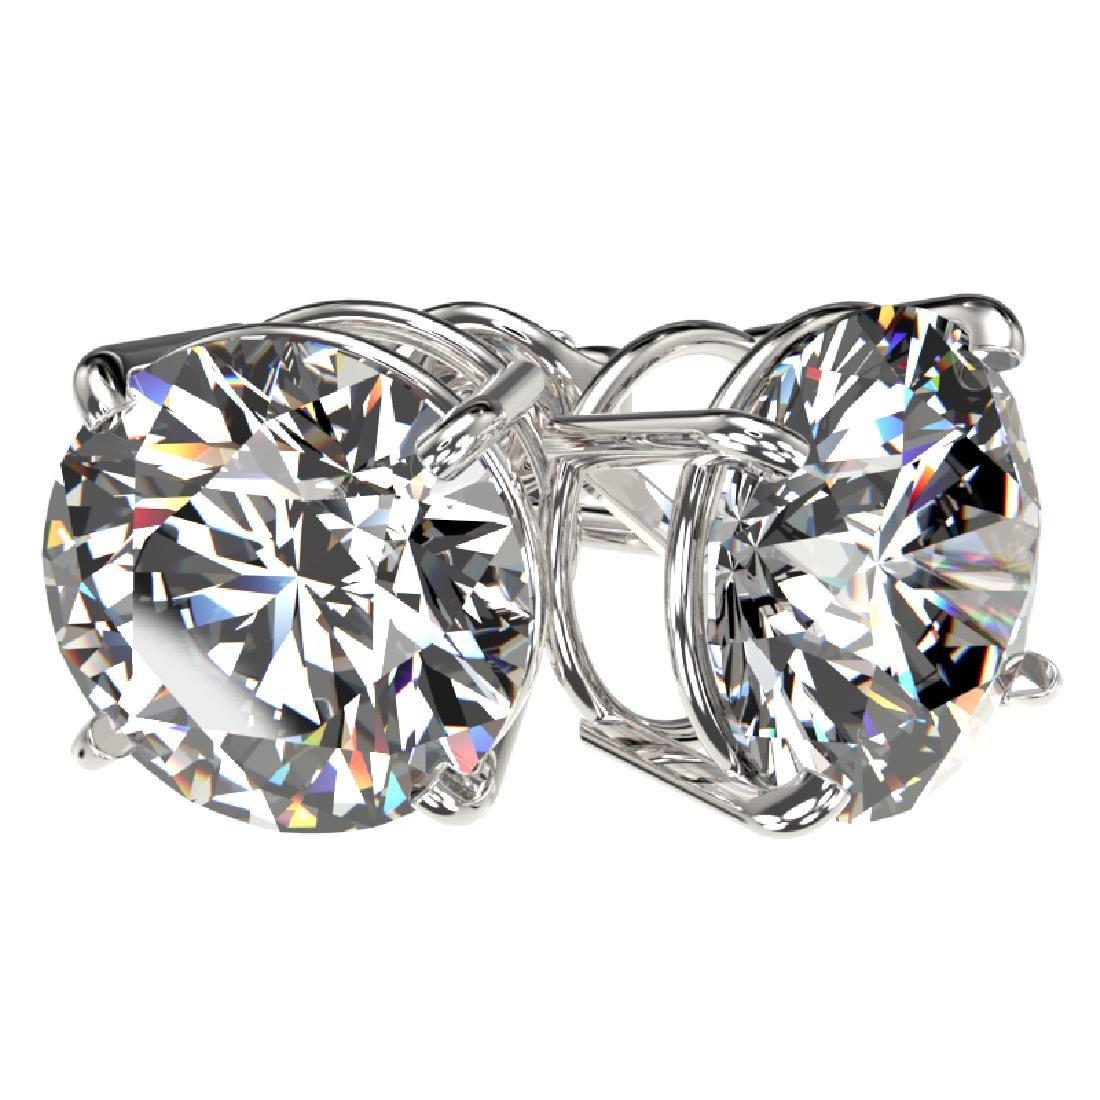 4.04 CTW Certified H-I Quality Diamond Stud Earrings - 3